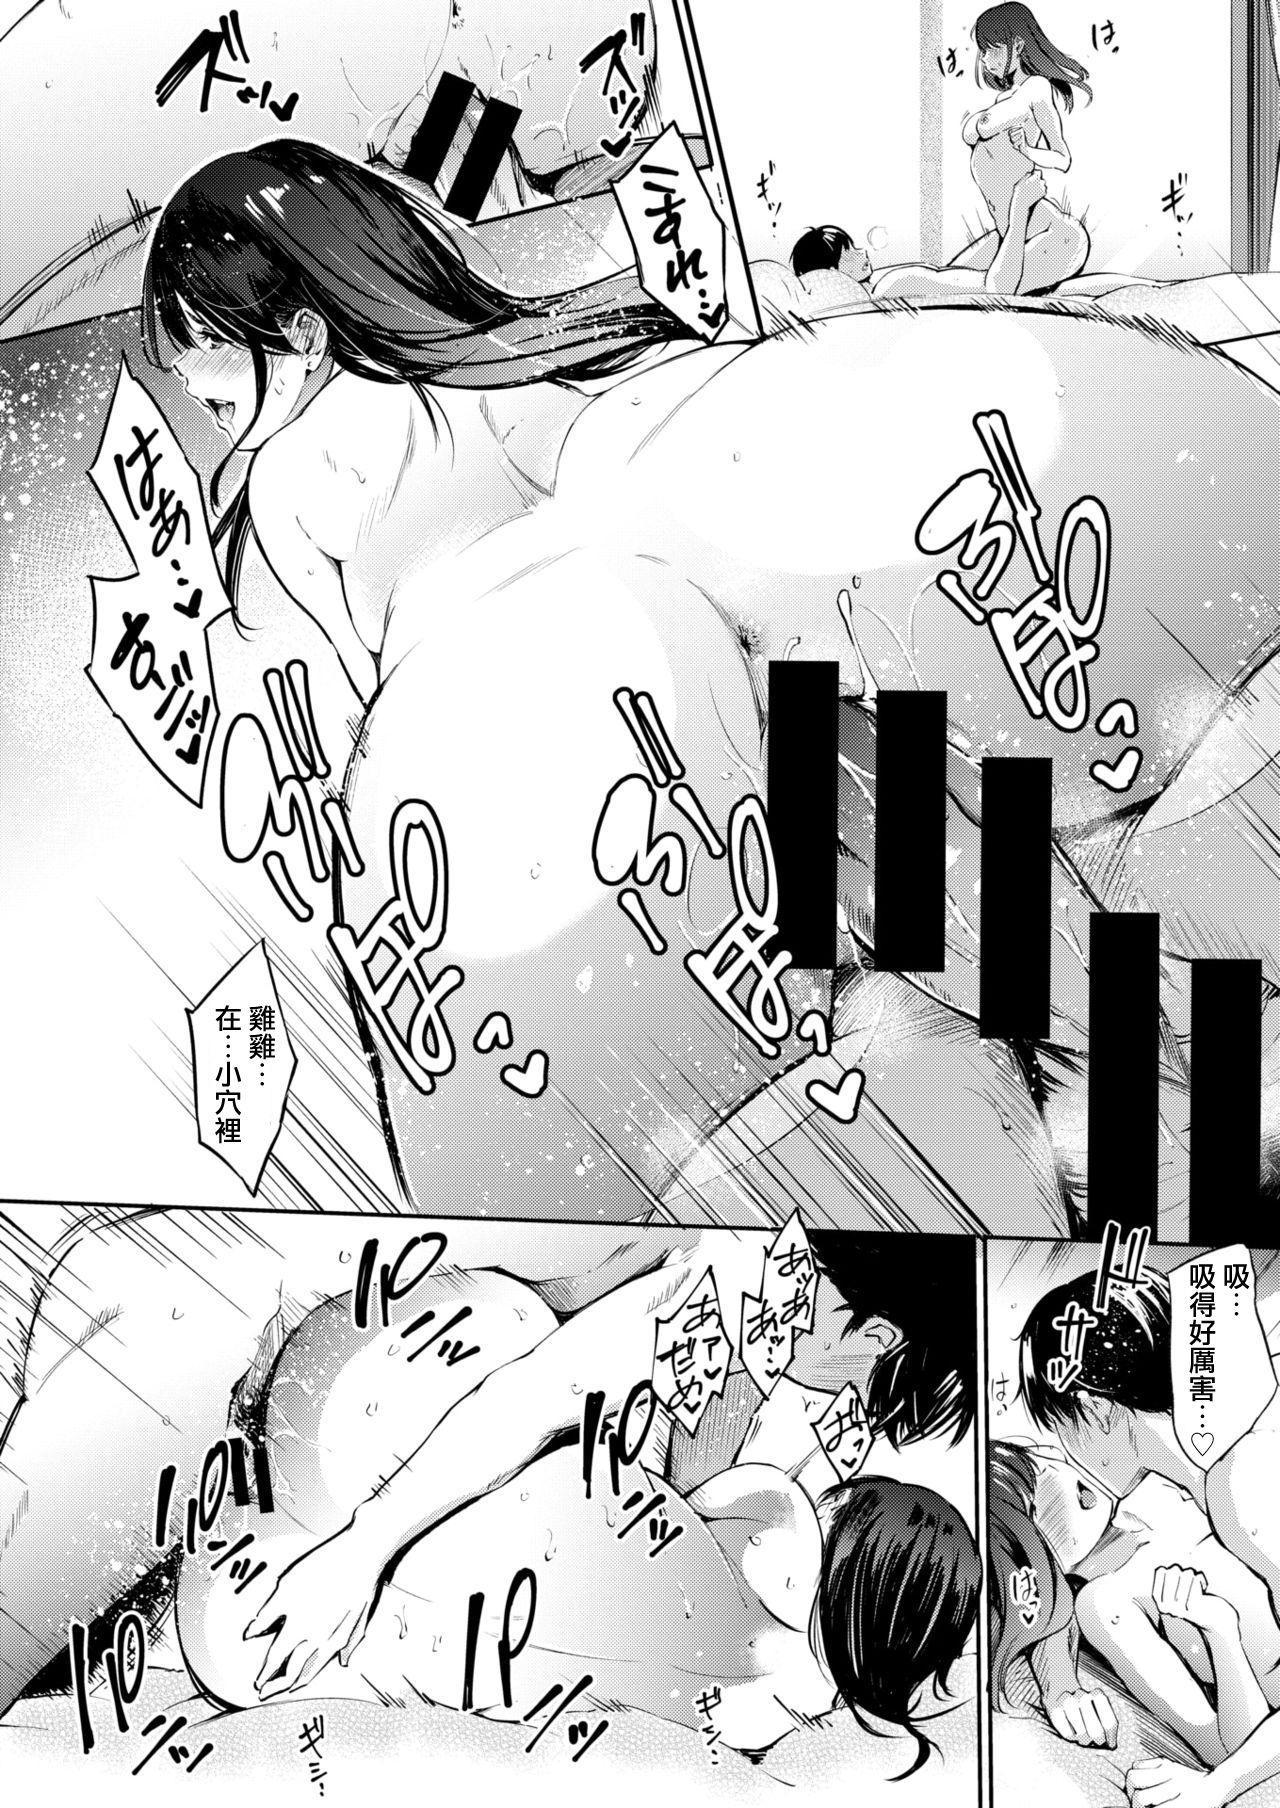 [Sanjuurou] delivery (sex) friend (COMIC X-EROS #73) [Chinese] [傳了一萬的點數卡序號過去結果就沒有下文了的個人翻譯] [Digital] 15